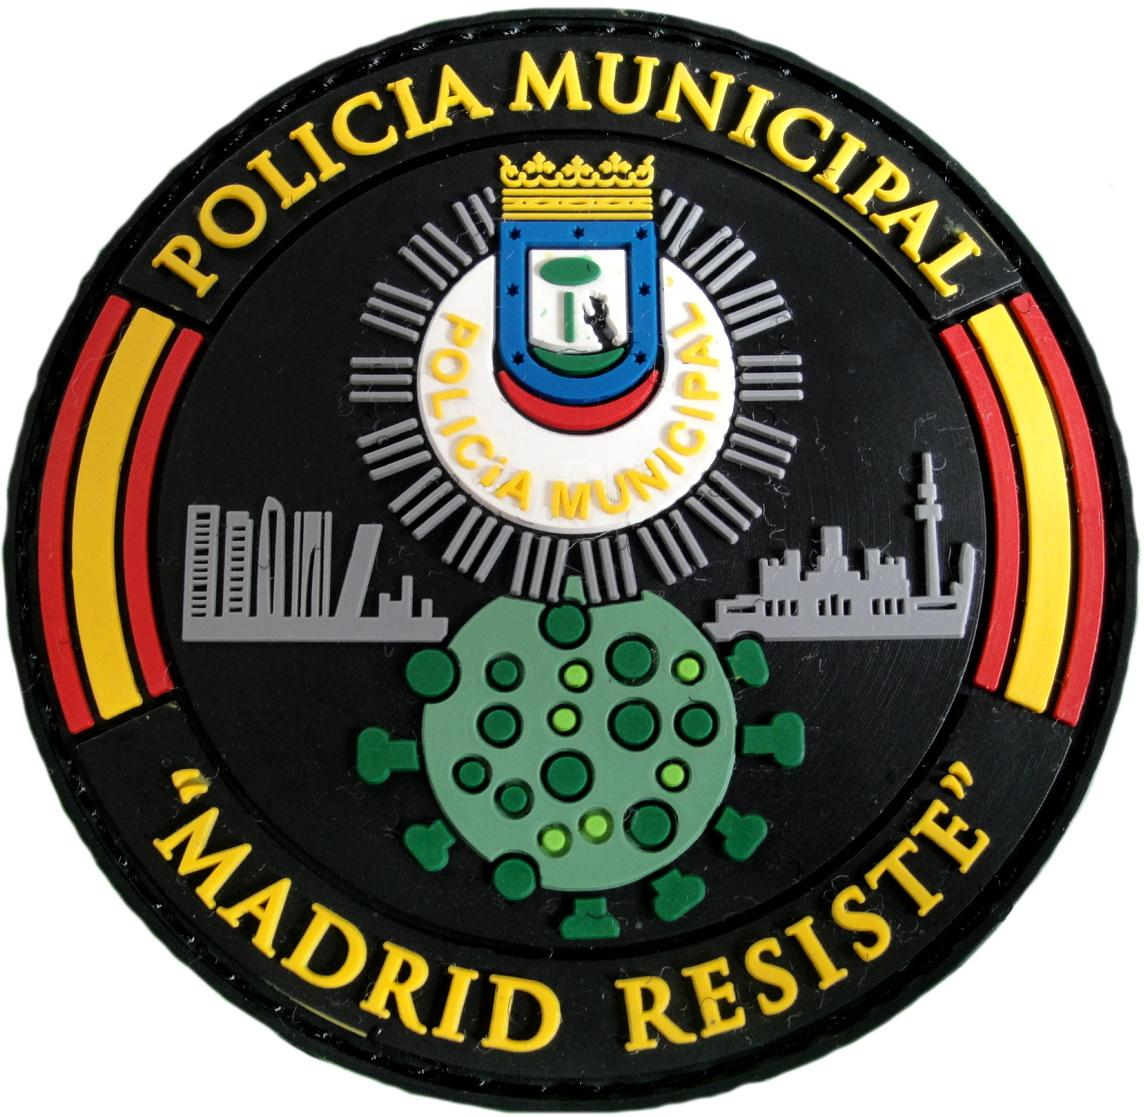 Policía Municipal Madrid Covid 19 Madrid resiste parche insignia emblema distintivo